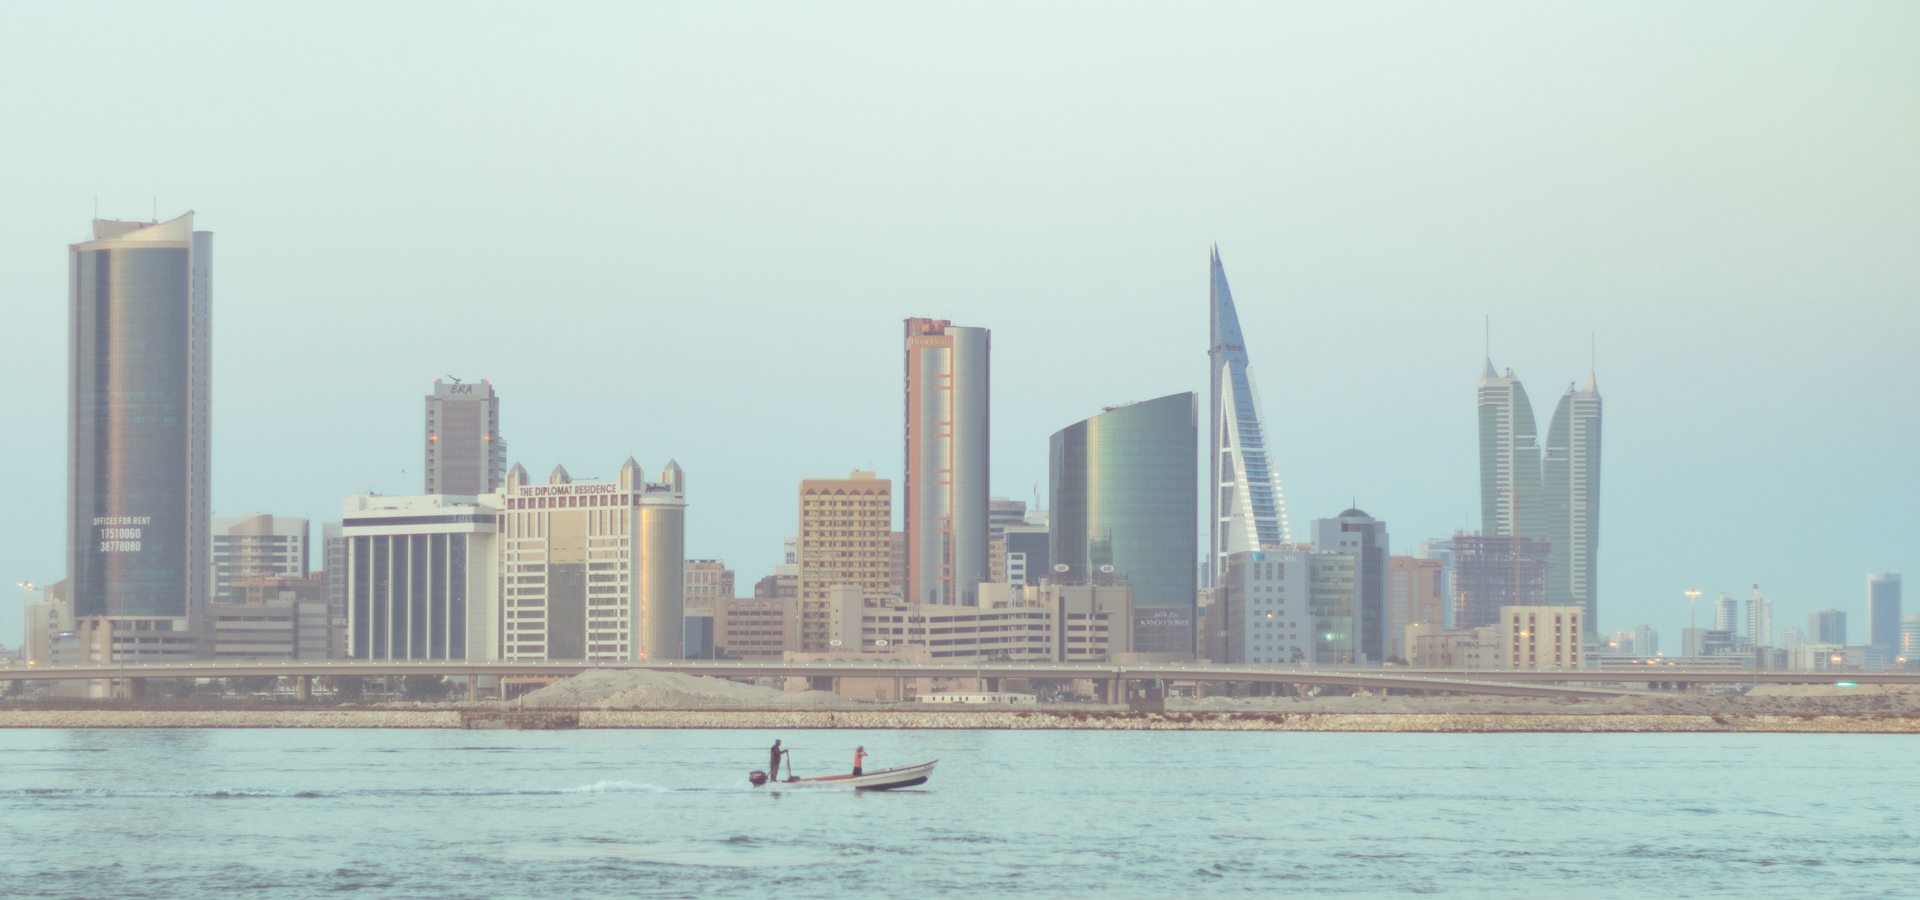 Peer-to-peer advisory in Bahrain